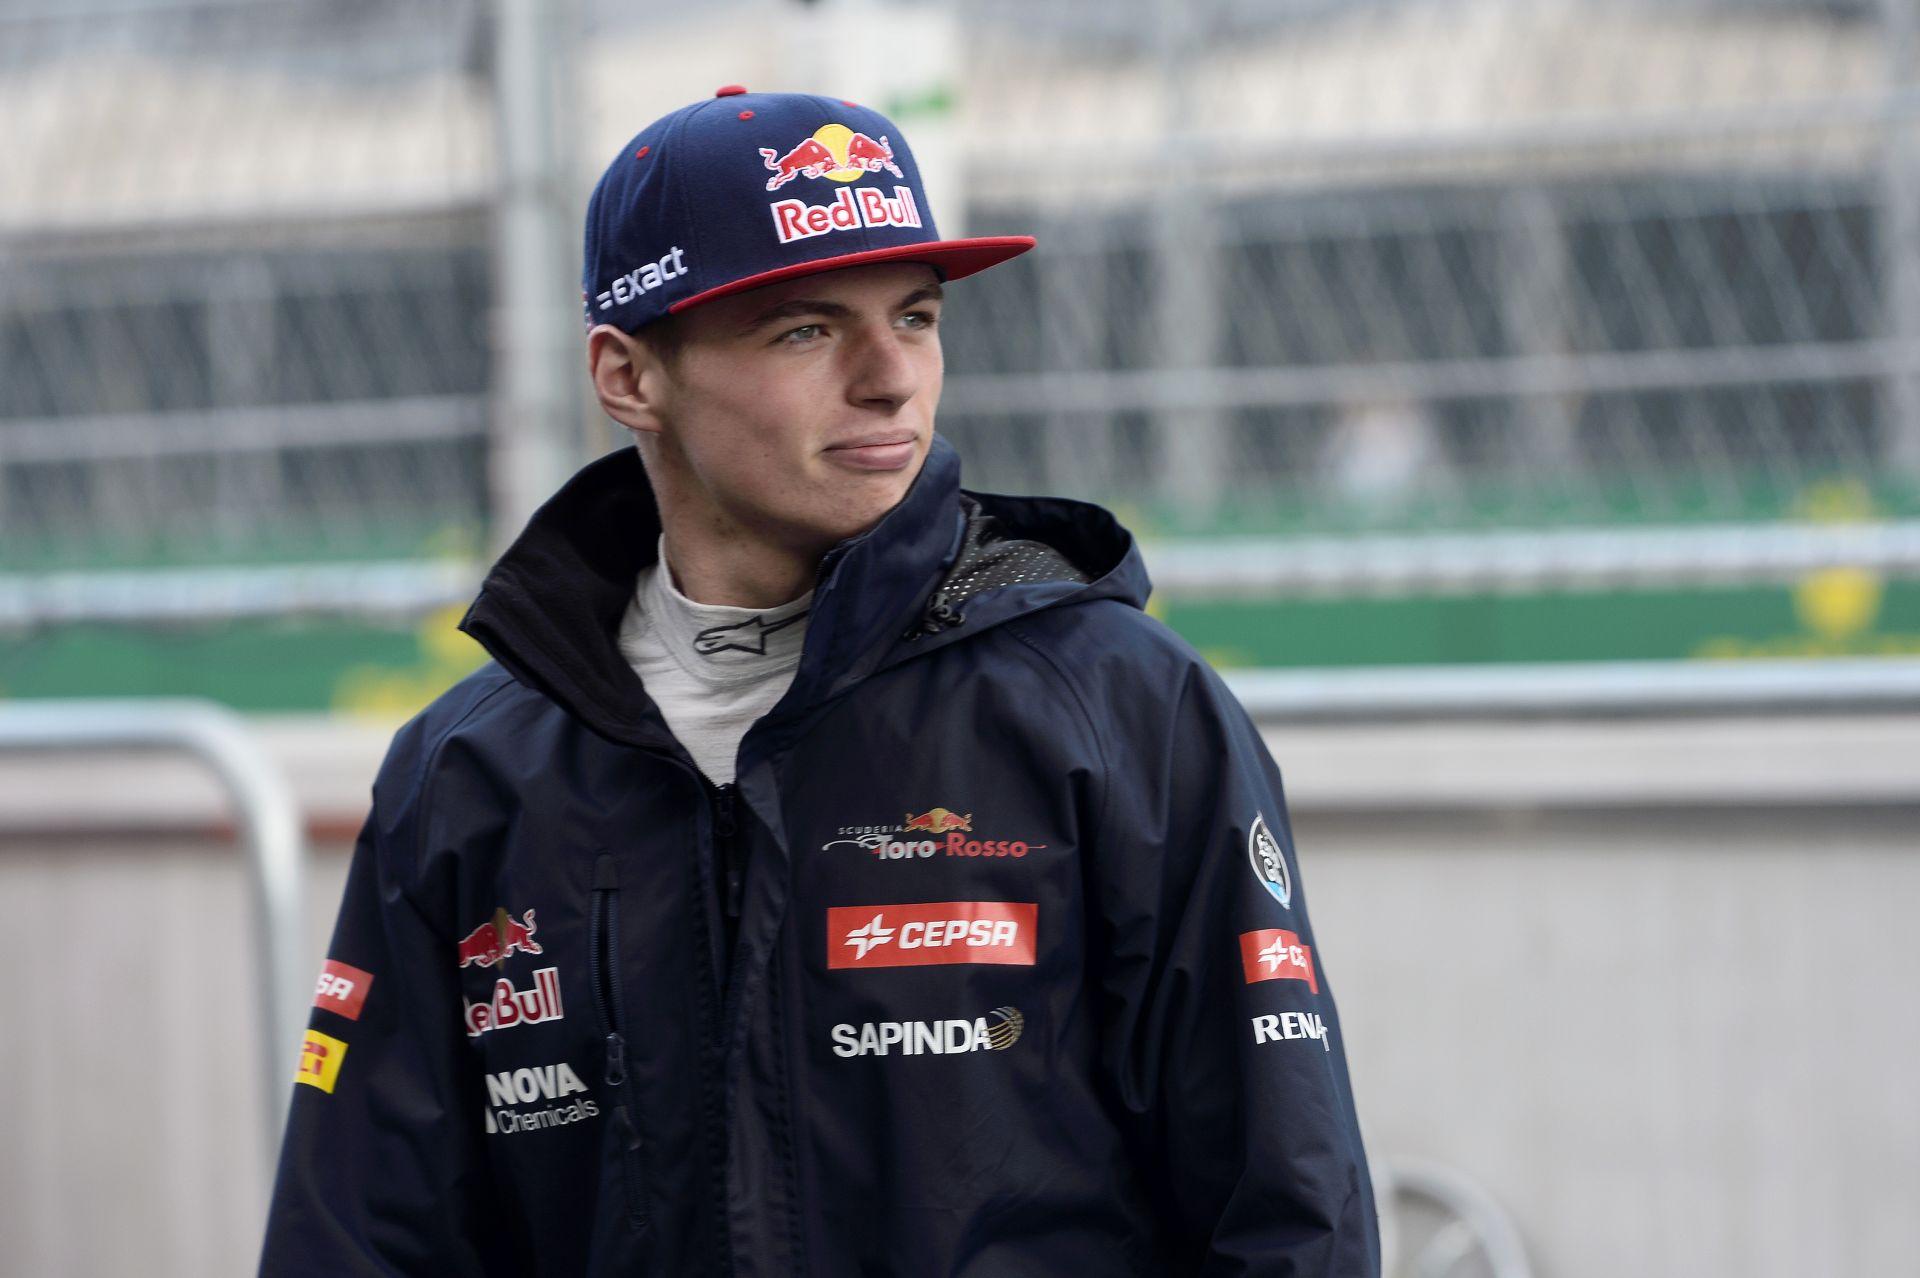 Max Verstappen még izgulni is elfelejtett élete első Forma-1-es versenyén!